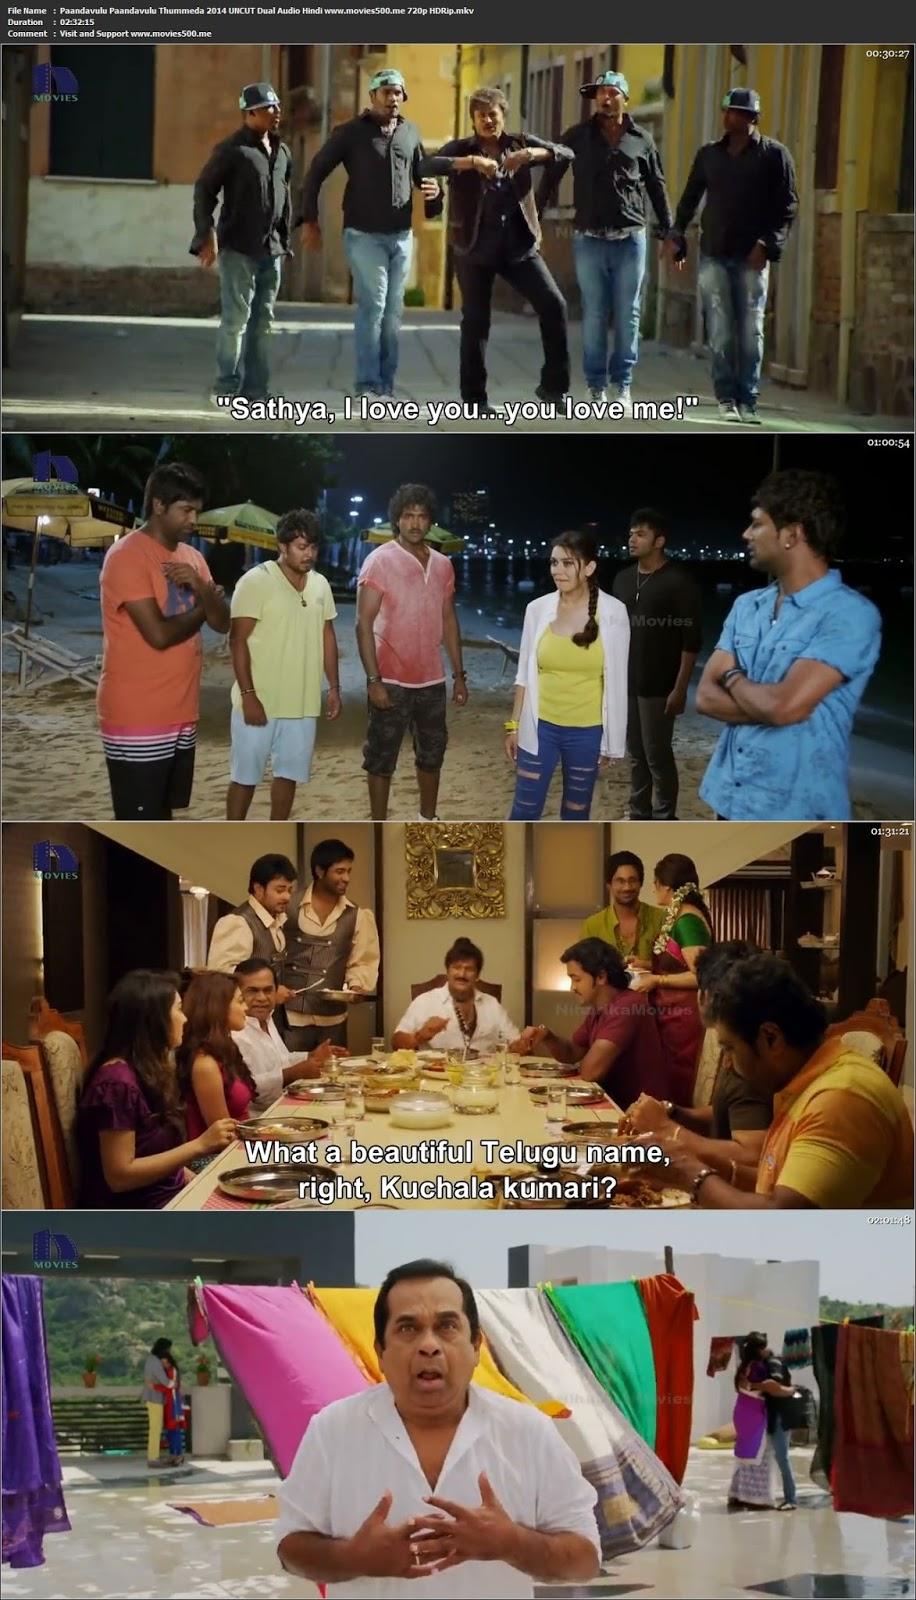 Paandavulu Paandavulu Thummeda 2014 UNCUT Dual Audio Hindi HDRip 720p at newbtcbank.com